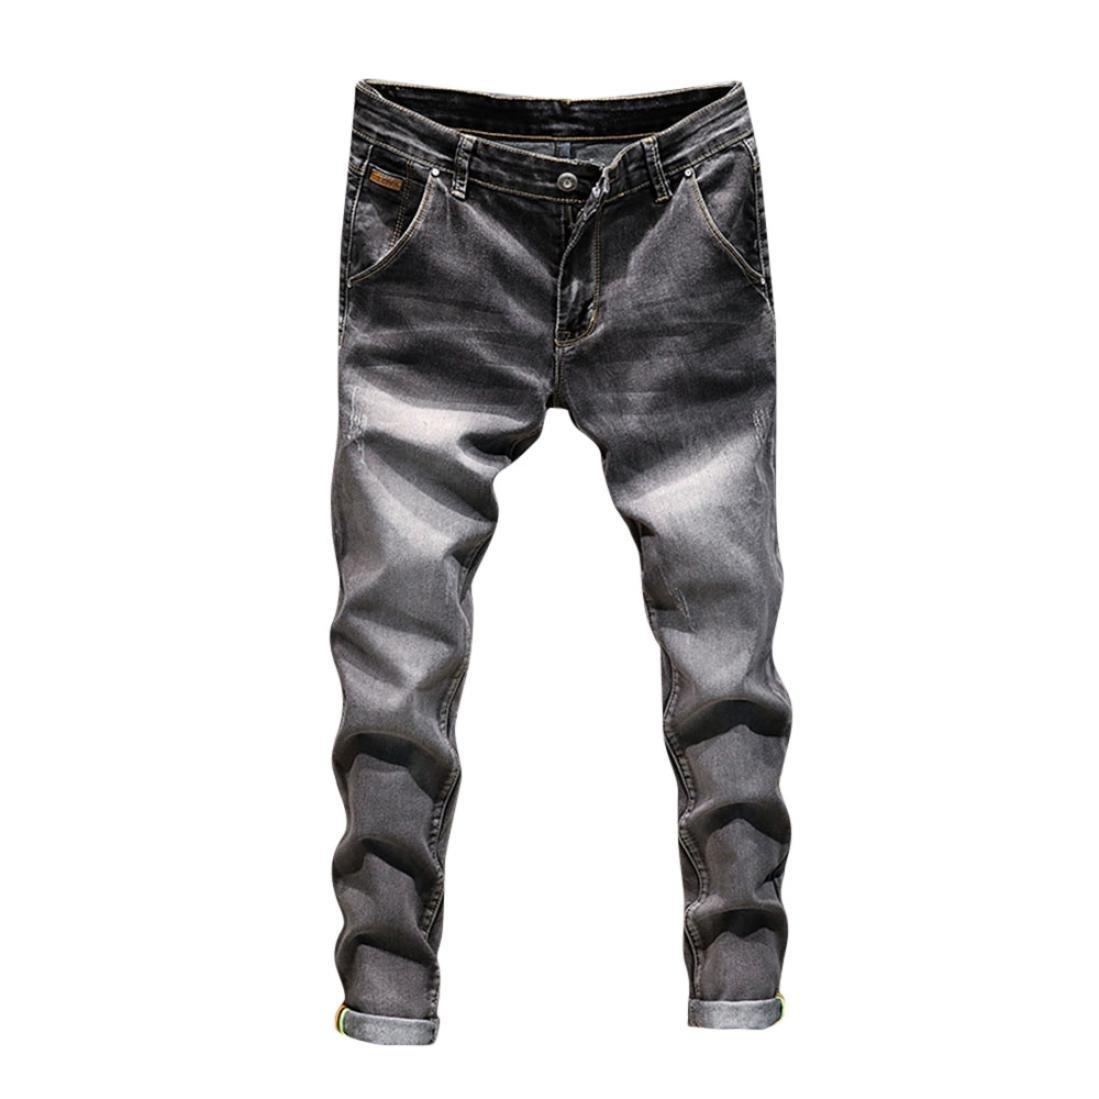 Promotion! Men Slim Jeans, NEARTIME Fashion Men's Autumn Casual Vintage Denim Hip Hop Work Trousers Washed Straight Pants